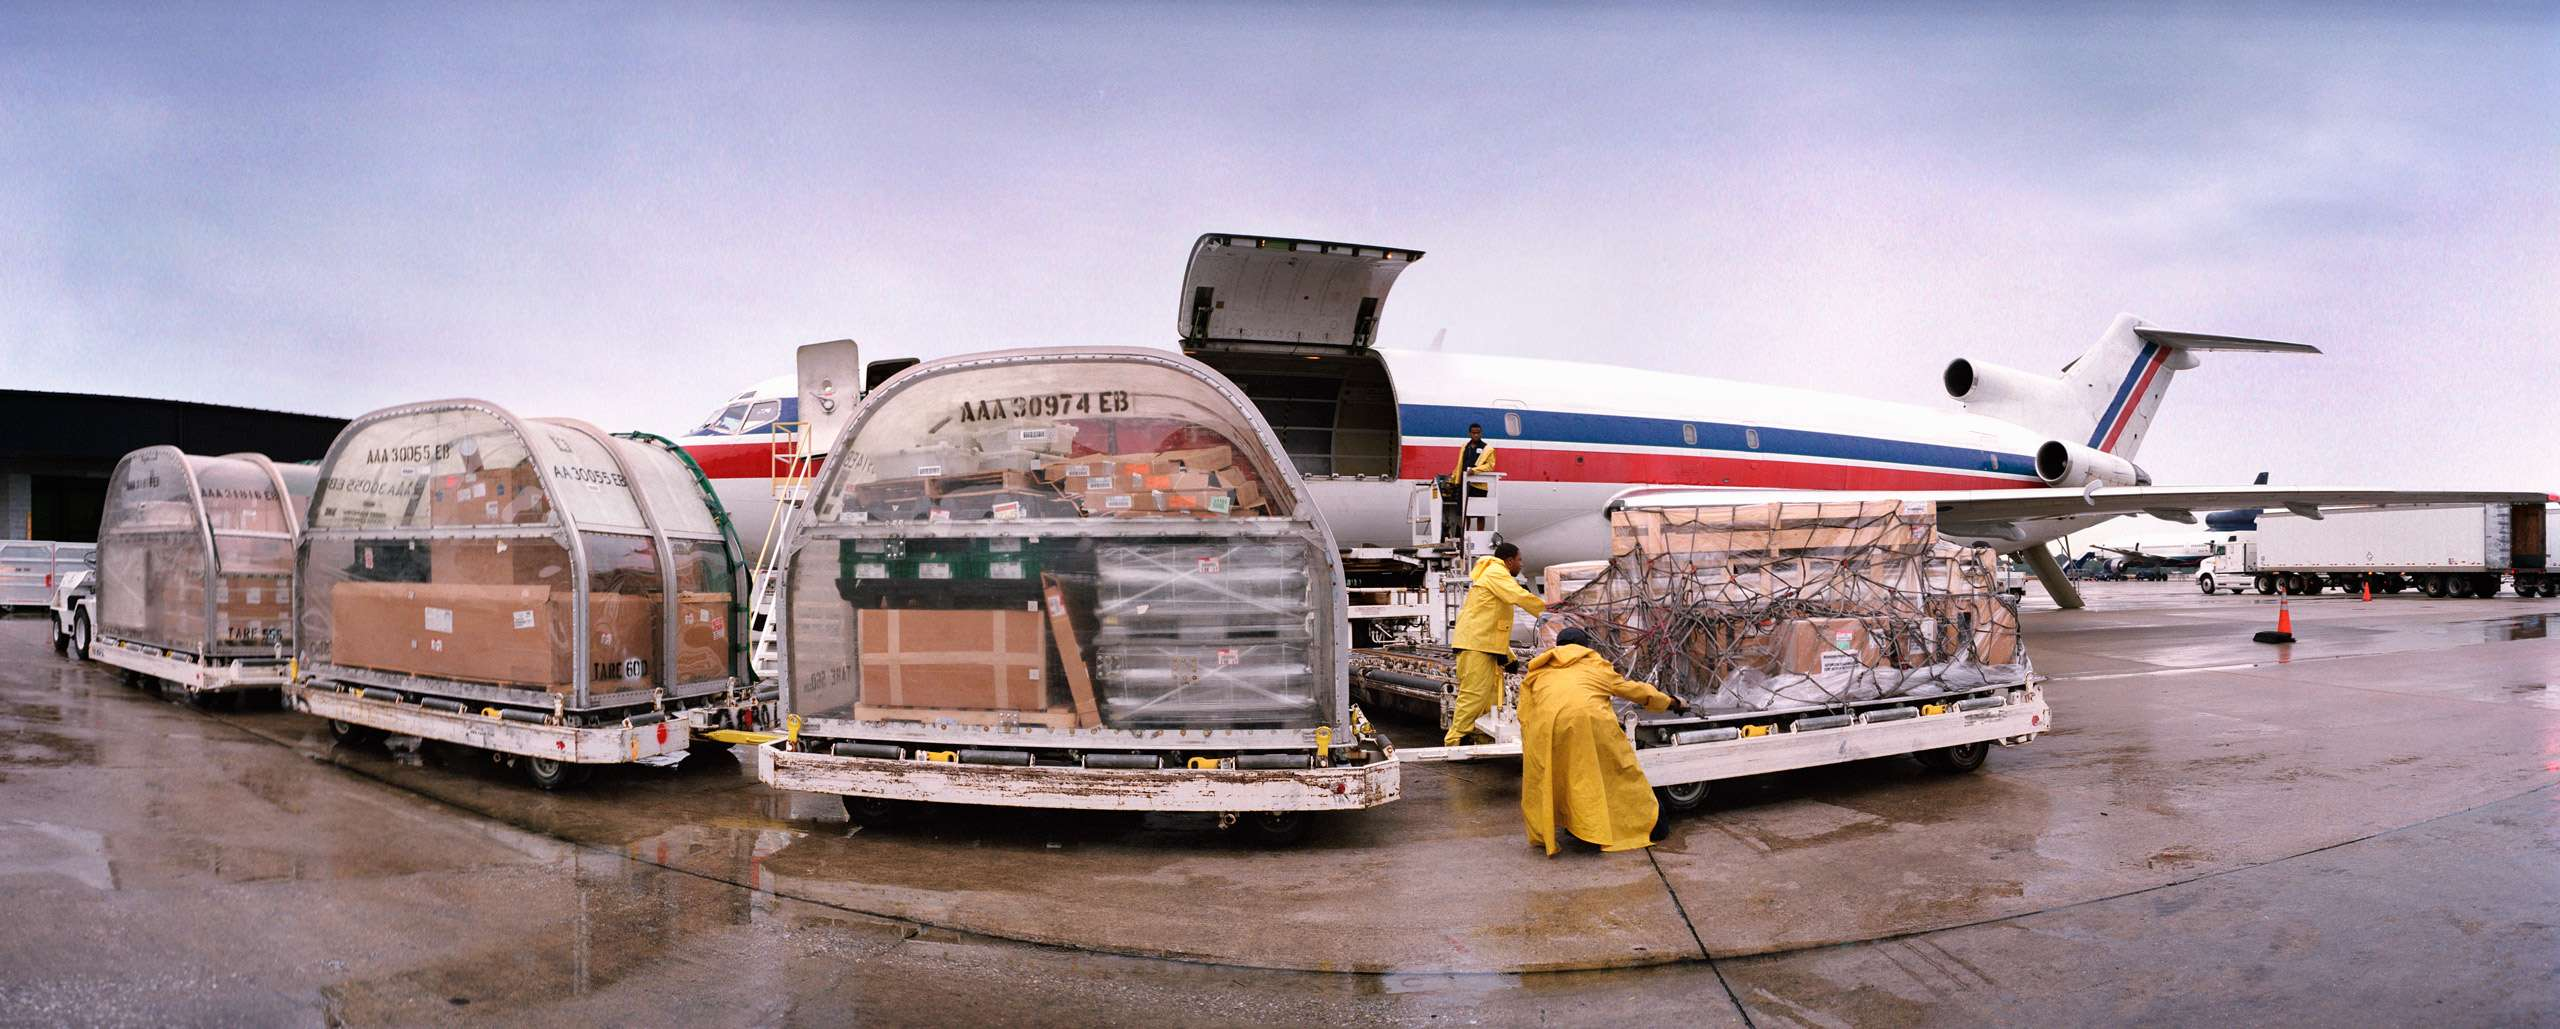 PORTFOLIO - Transportation  #13-TIB193